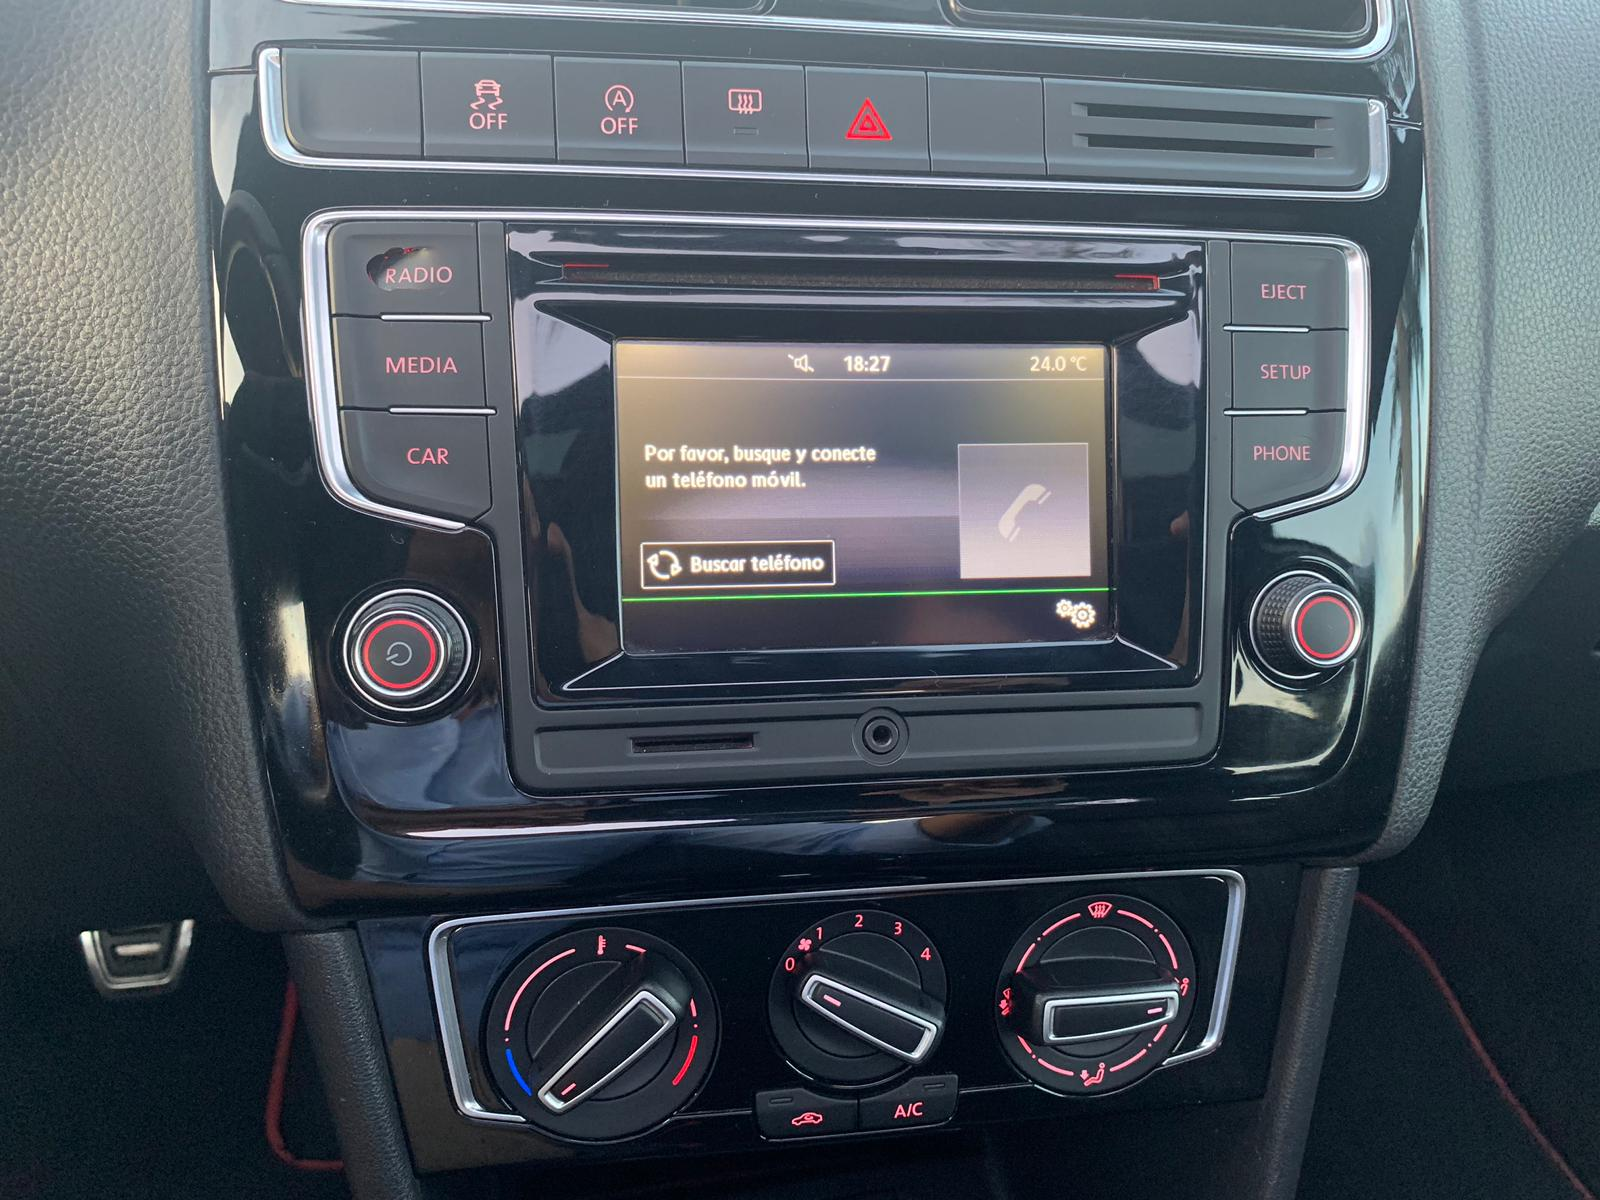 POLO GTI 1.9TSI 190 CV 2015 SEP19 (12)